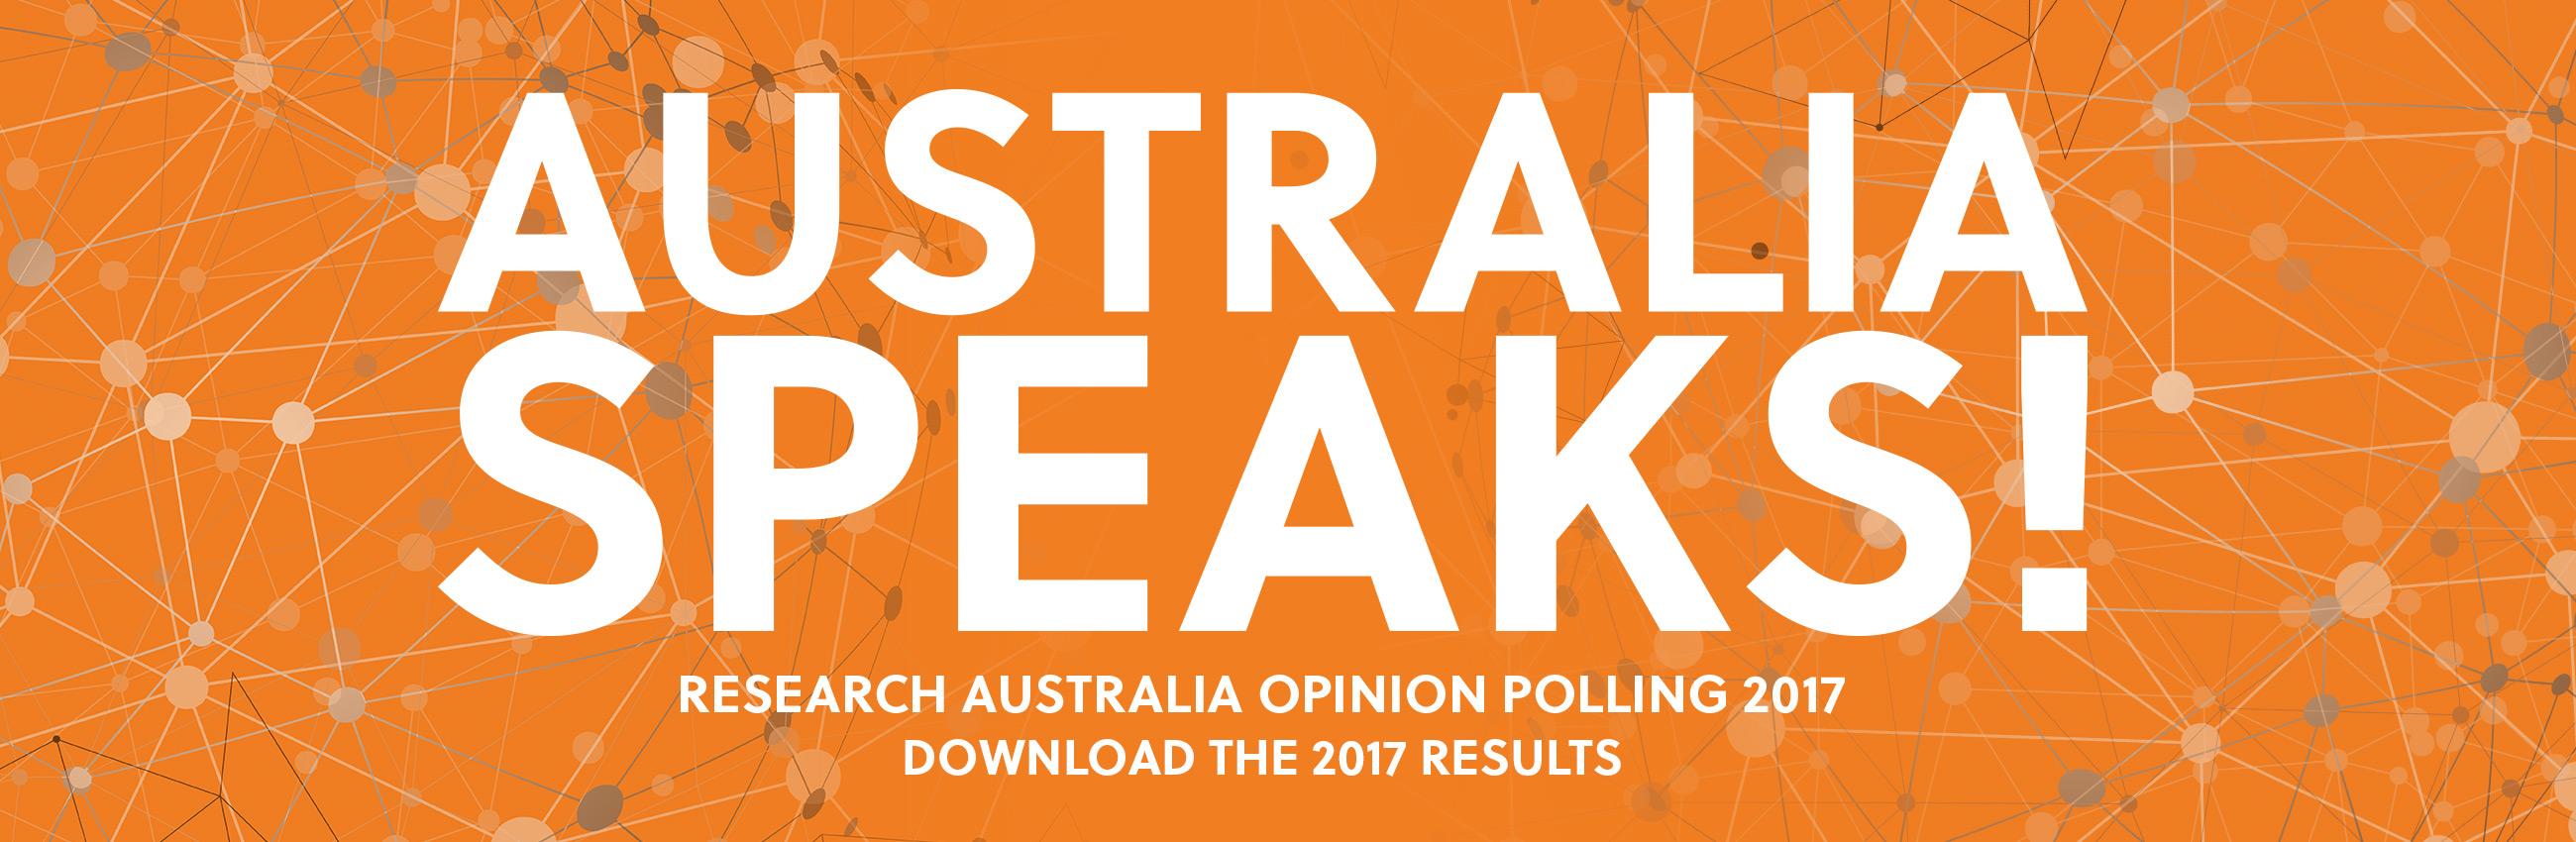 Research Australia Opinion Polling 2017